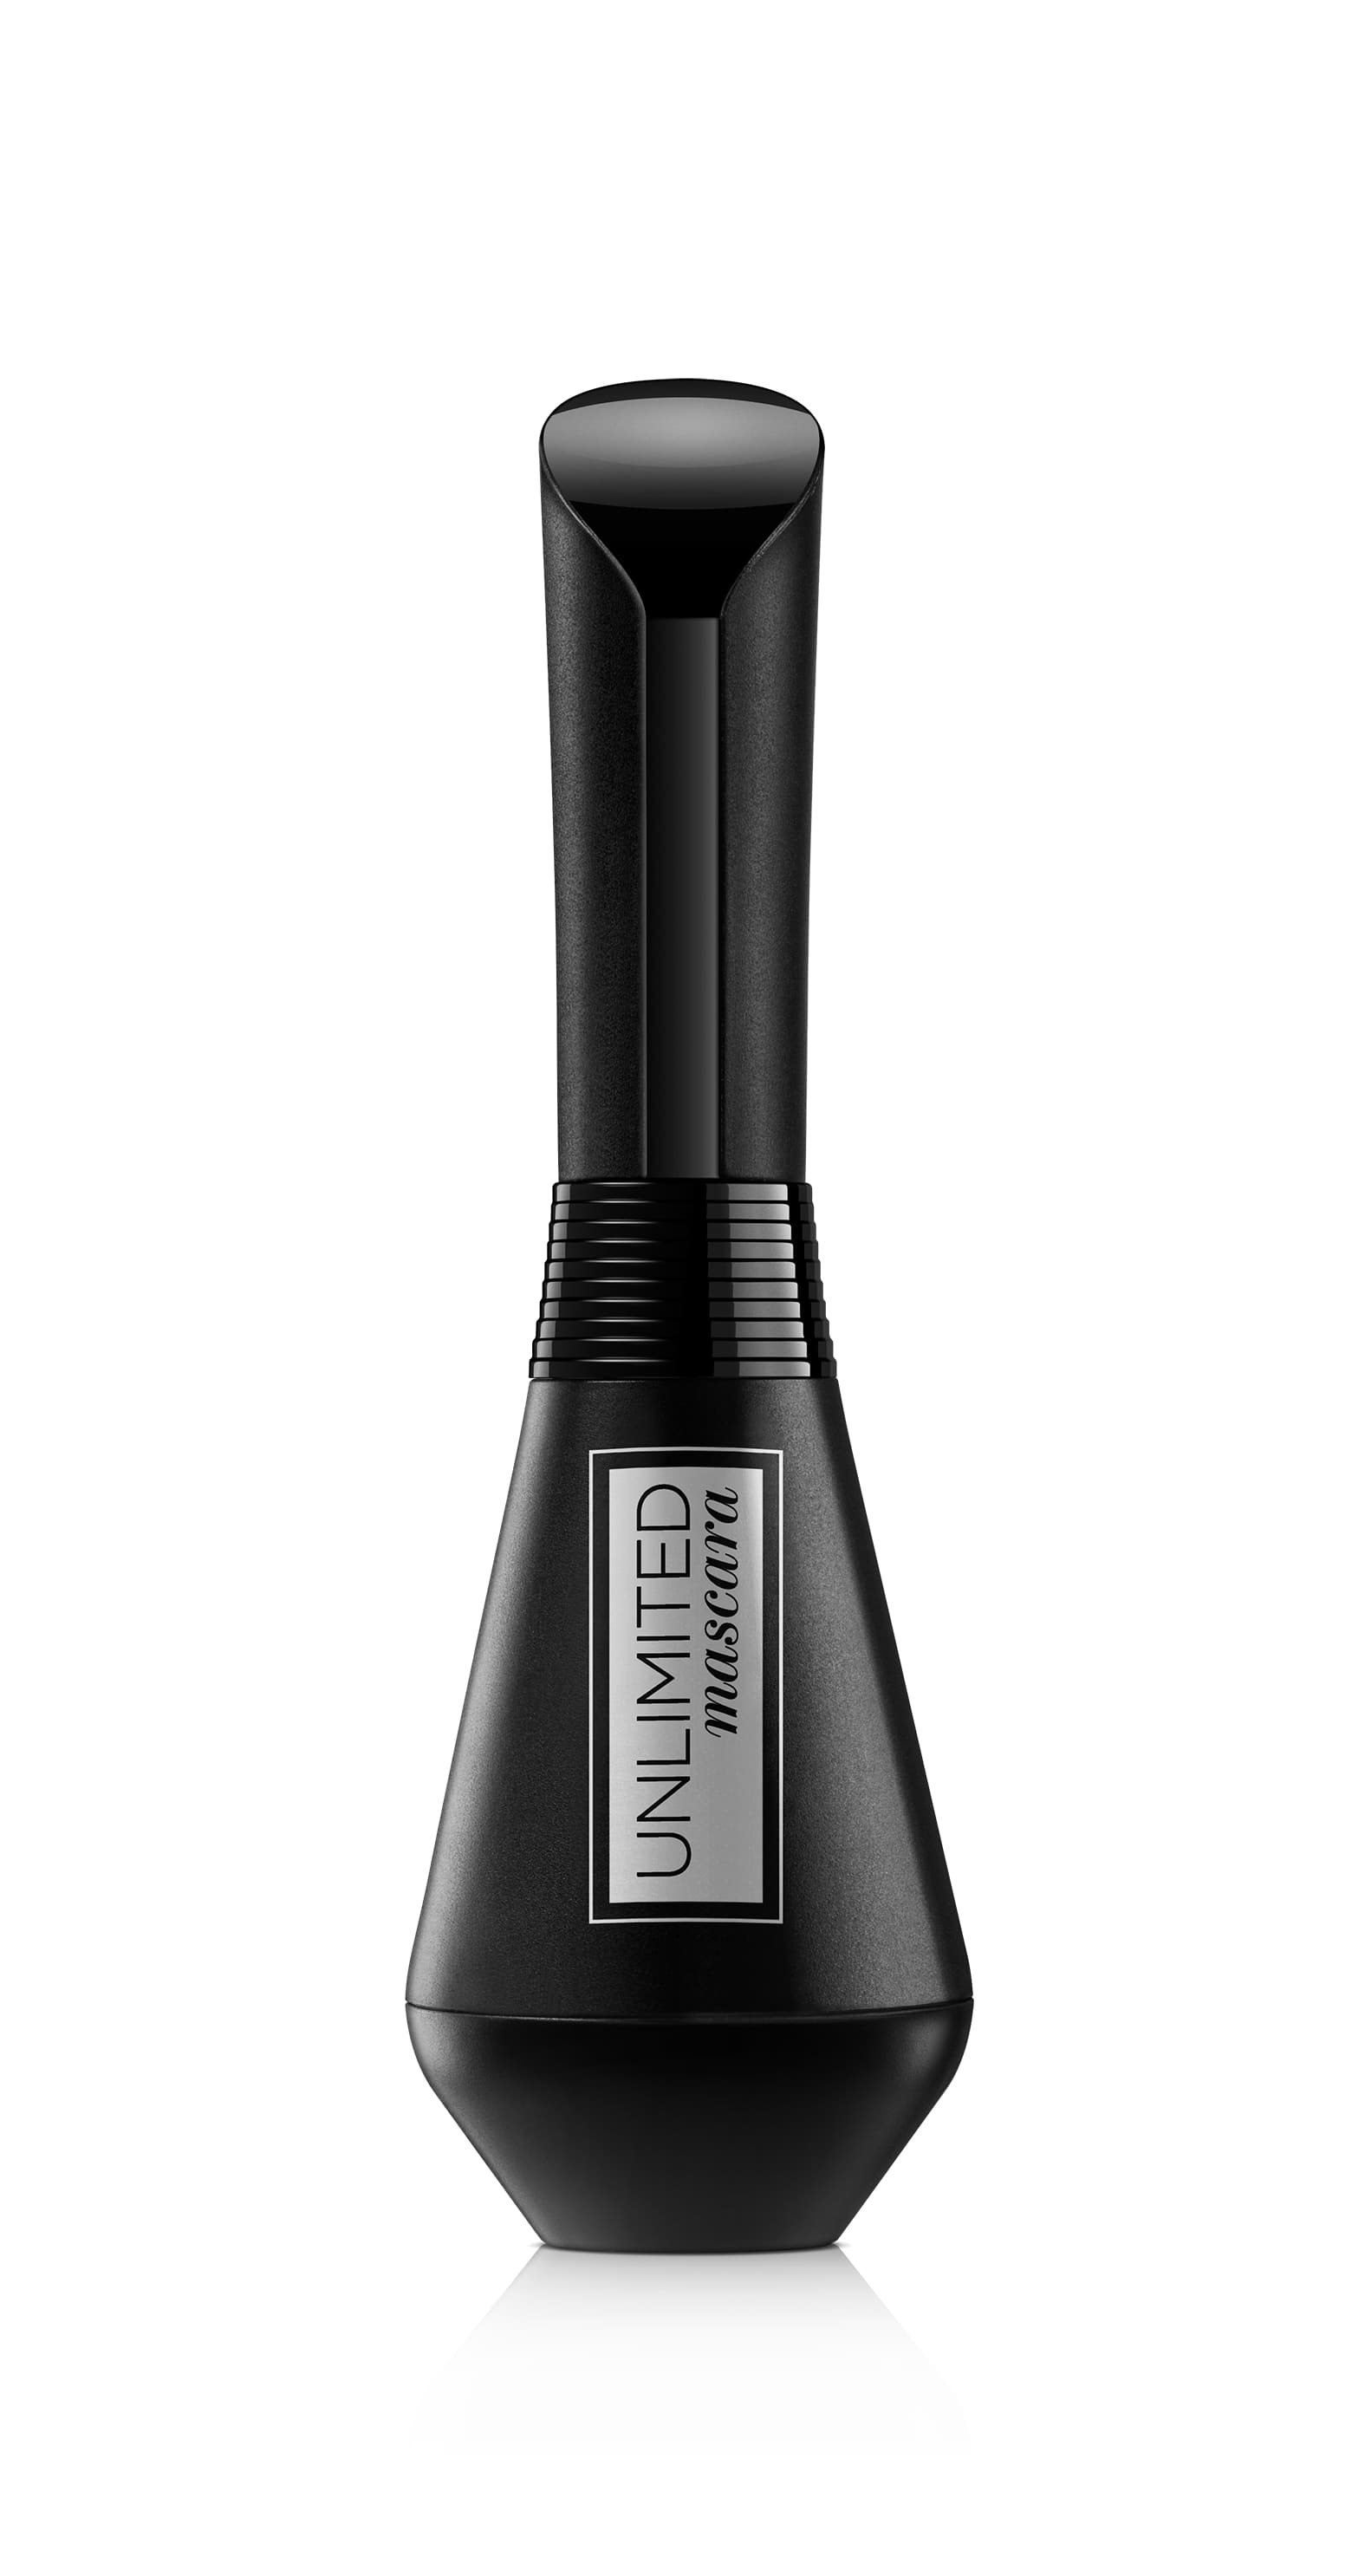 Unlimited Mascara Black